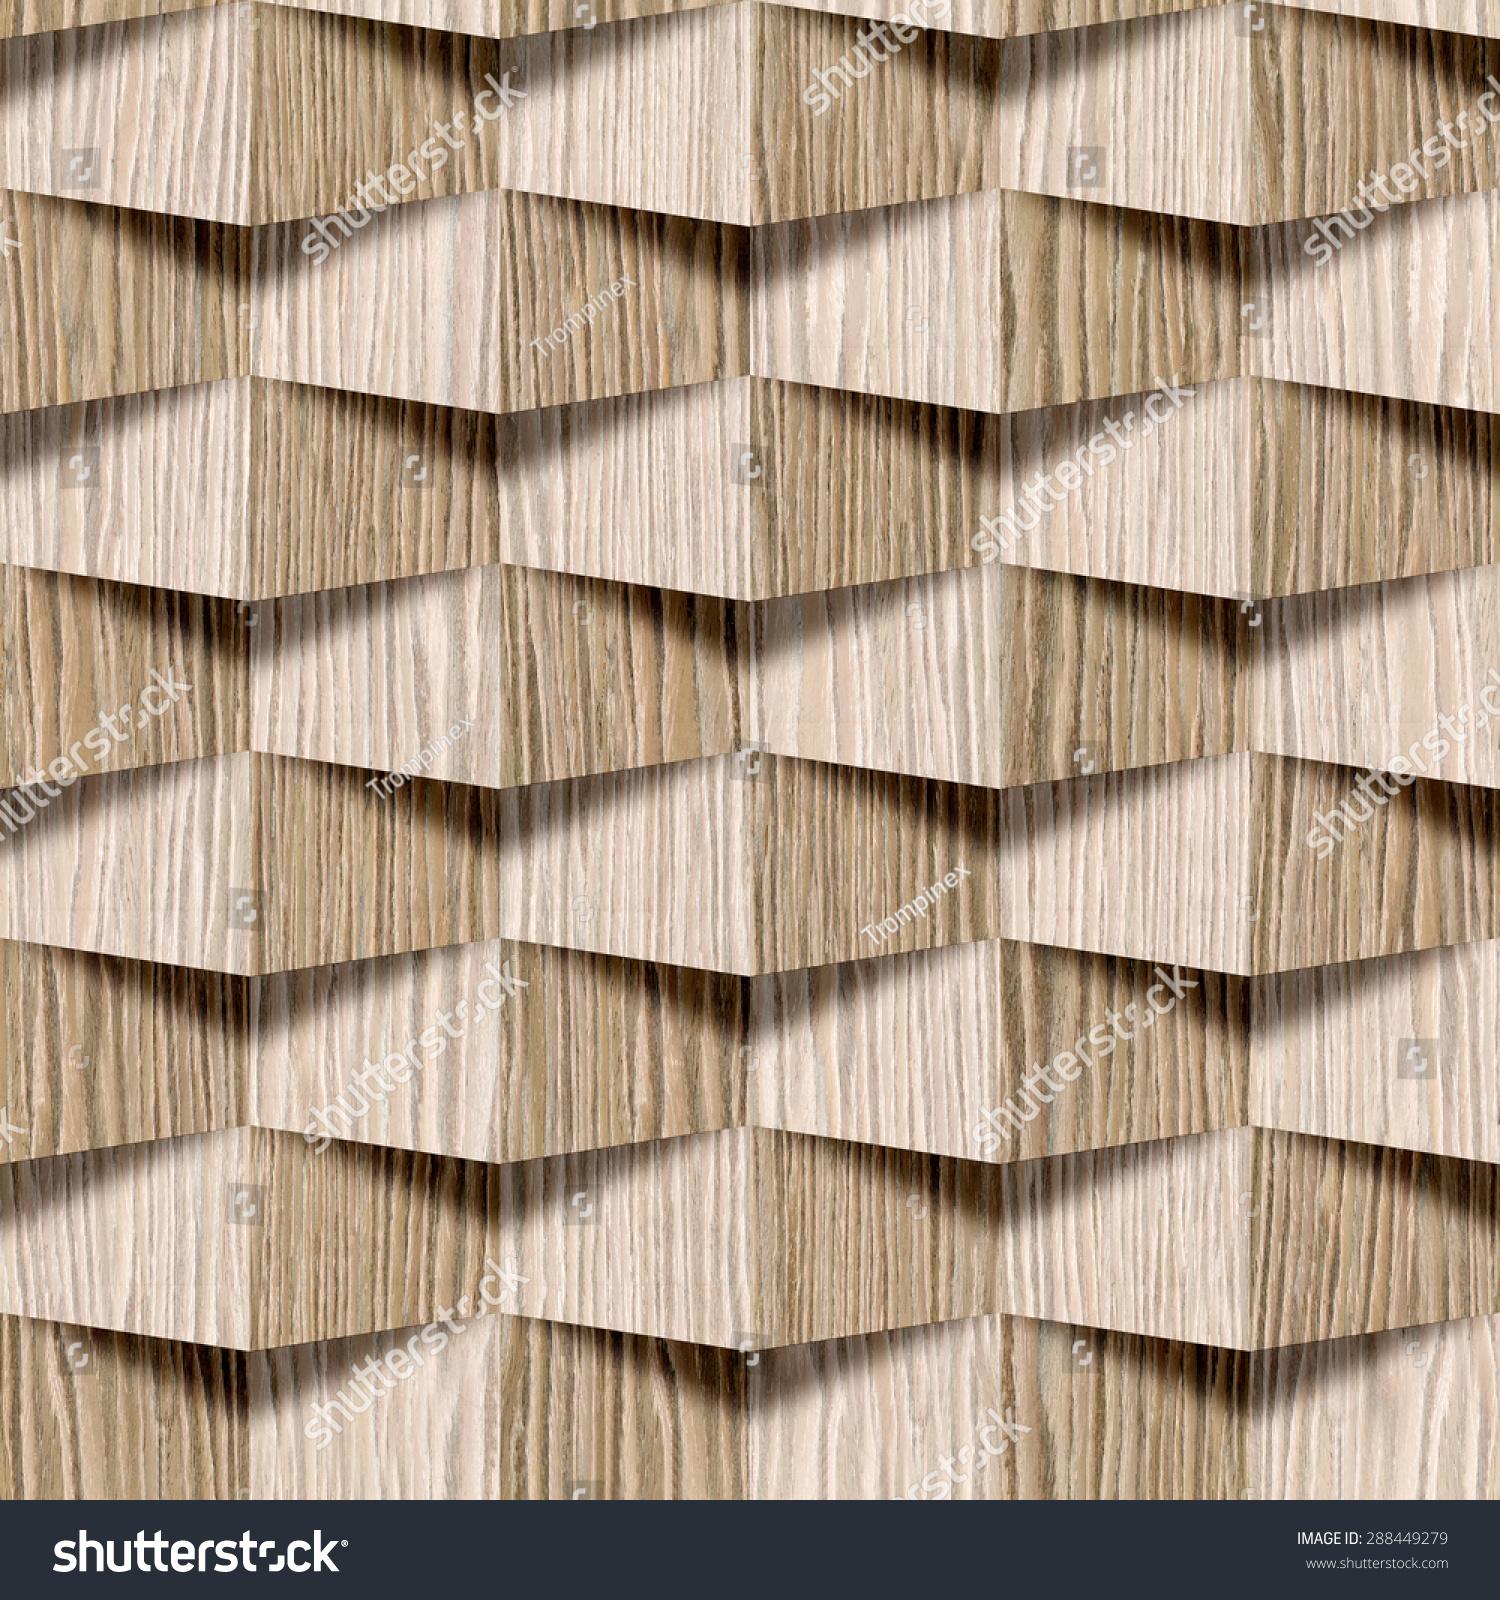 Abstract Decorative Design Interior Wall Panel Stock